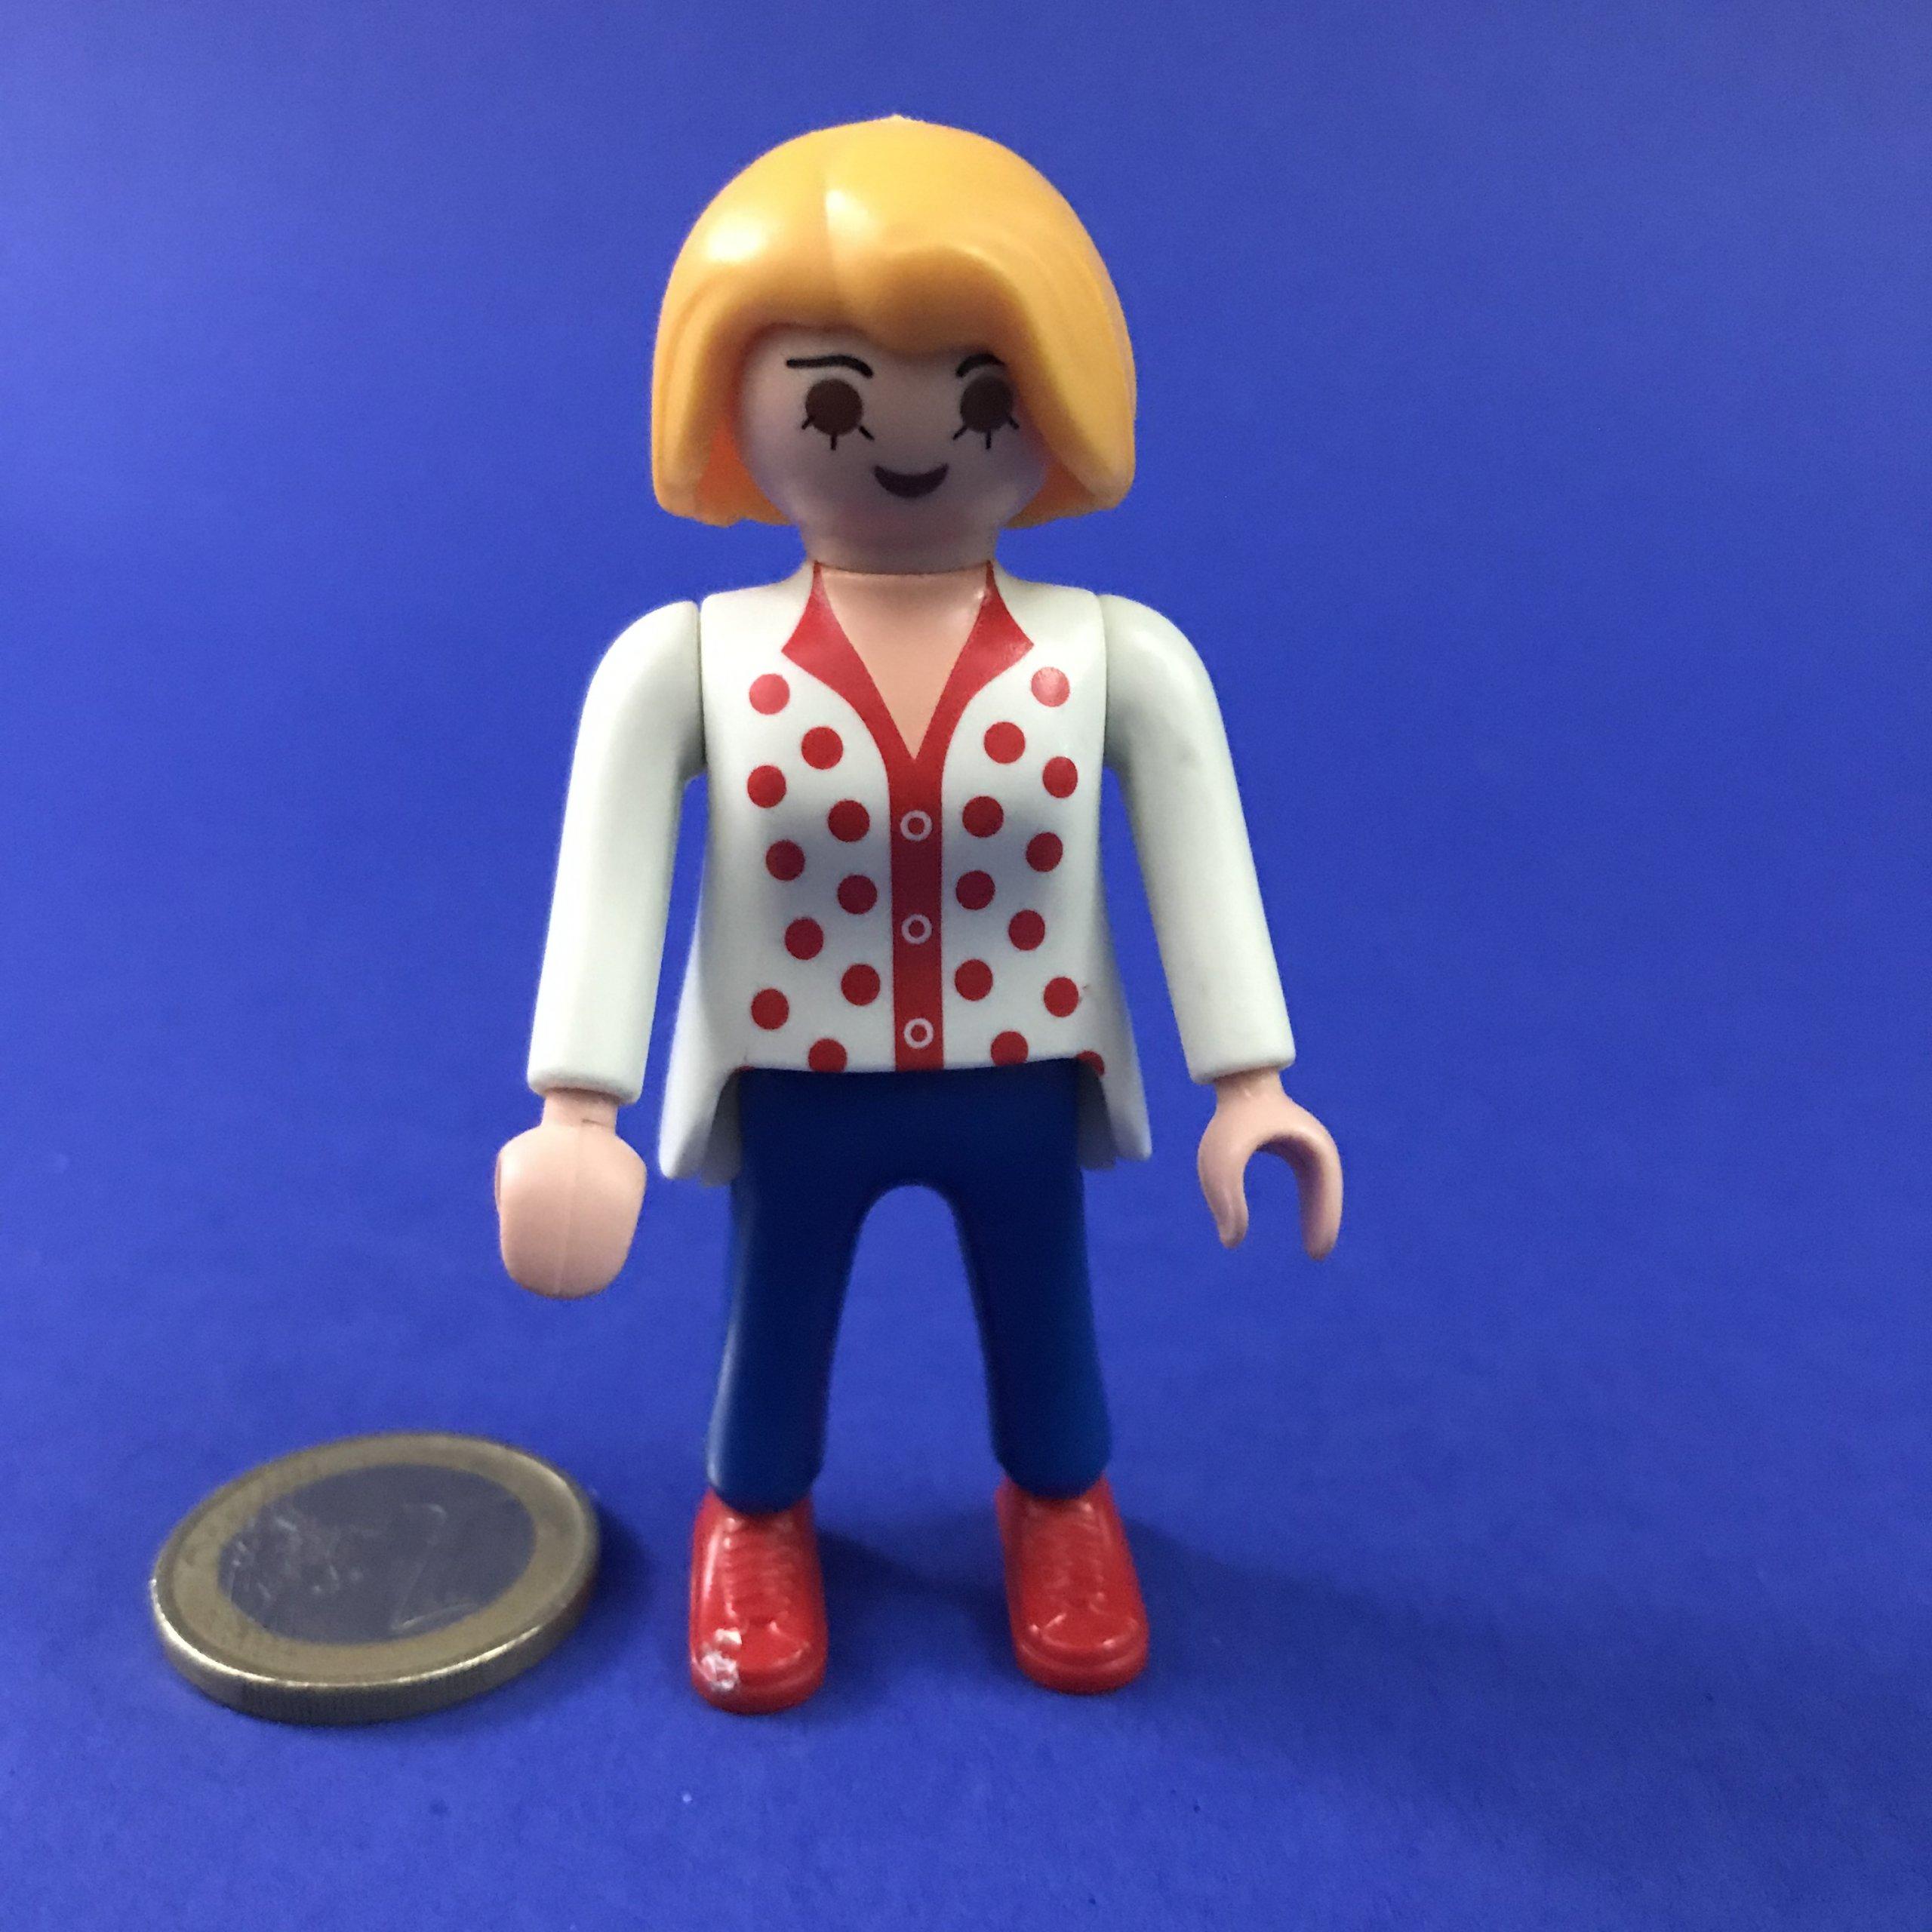 Playmobil-vrouw-blond